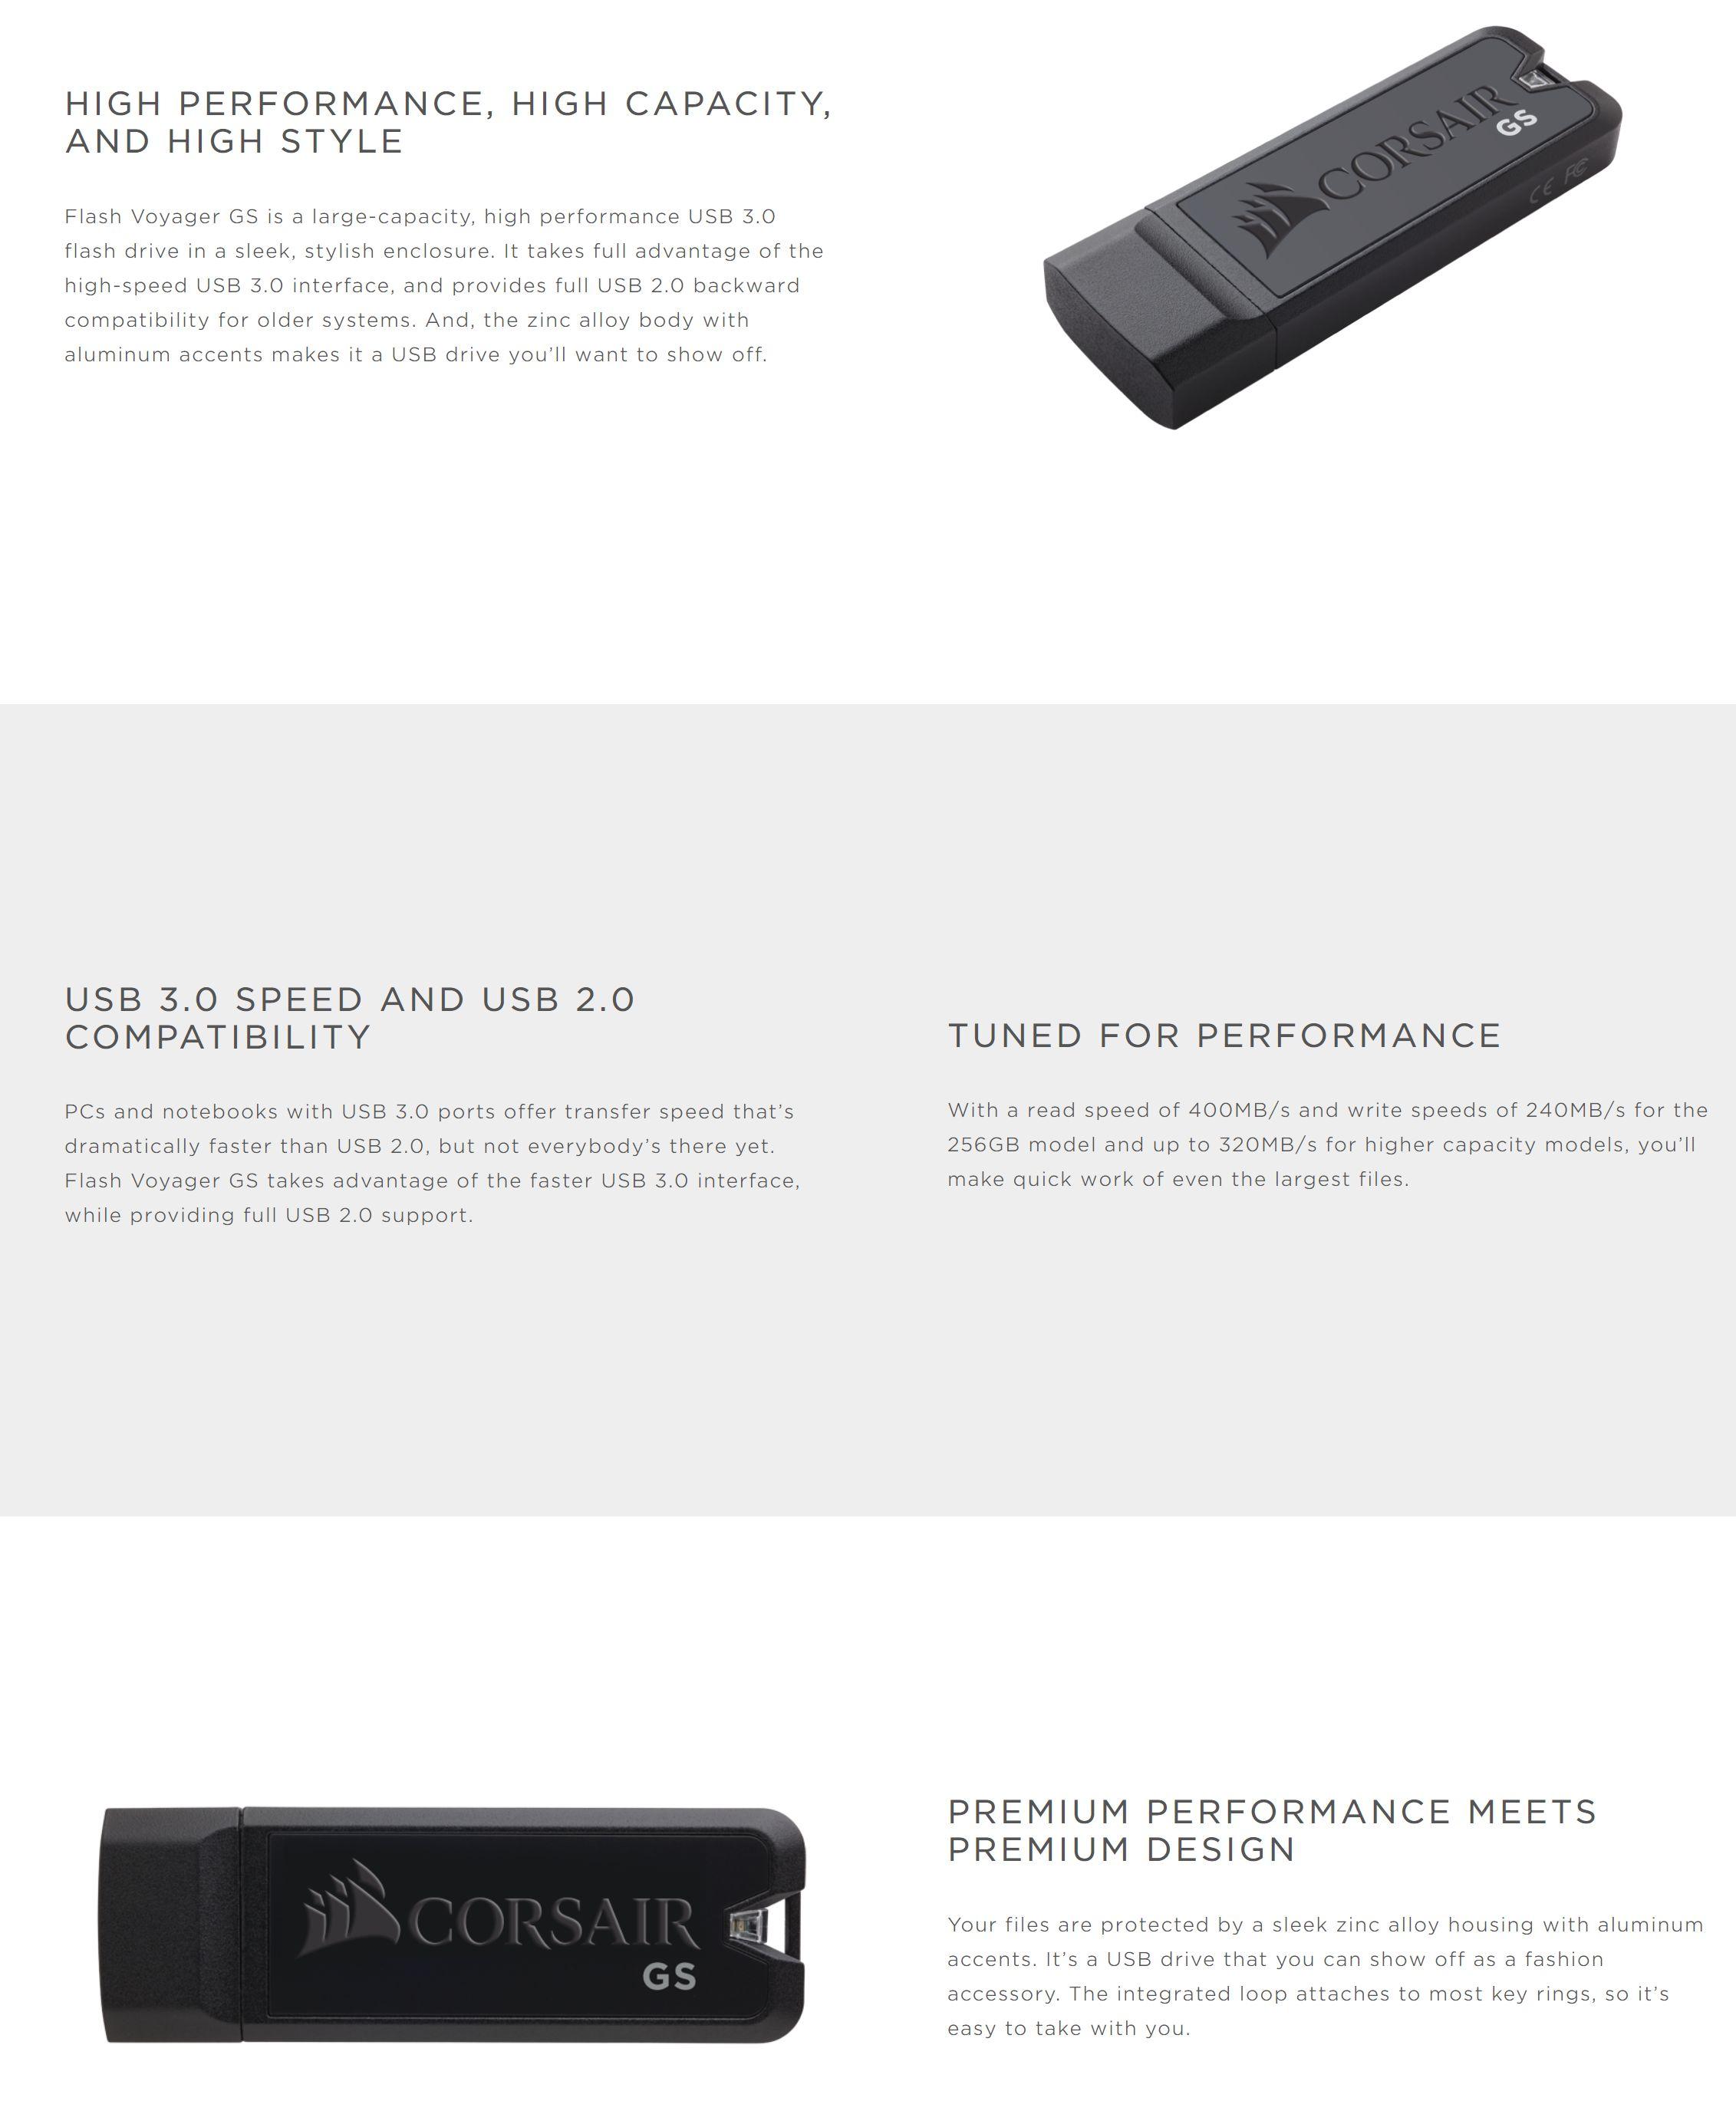 #1467 - 'Flash Voyager® GS 256GB USB 3_0 Flash Drive' - www_corsair_com.jpg